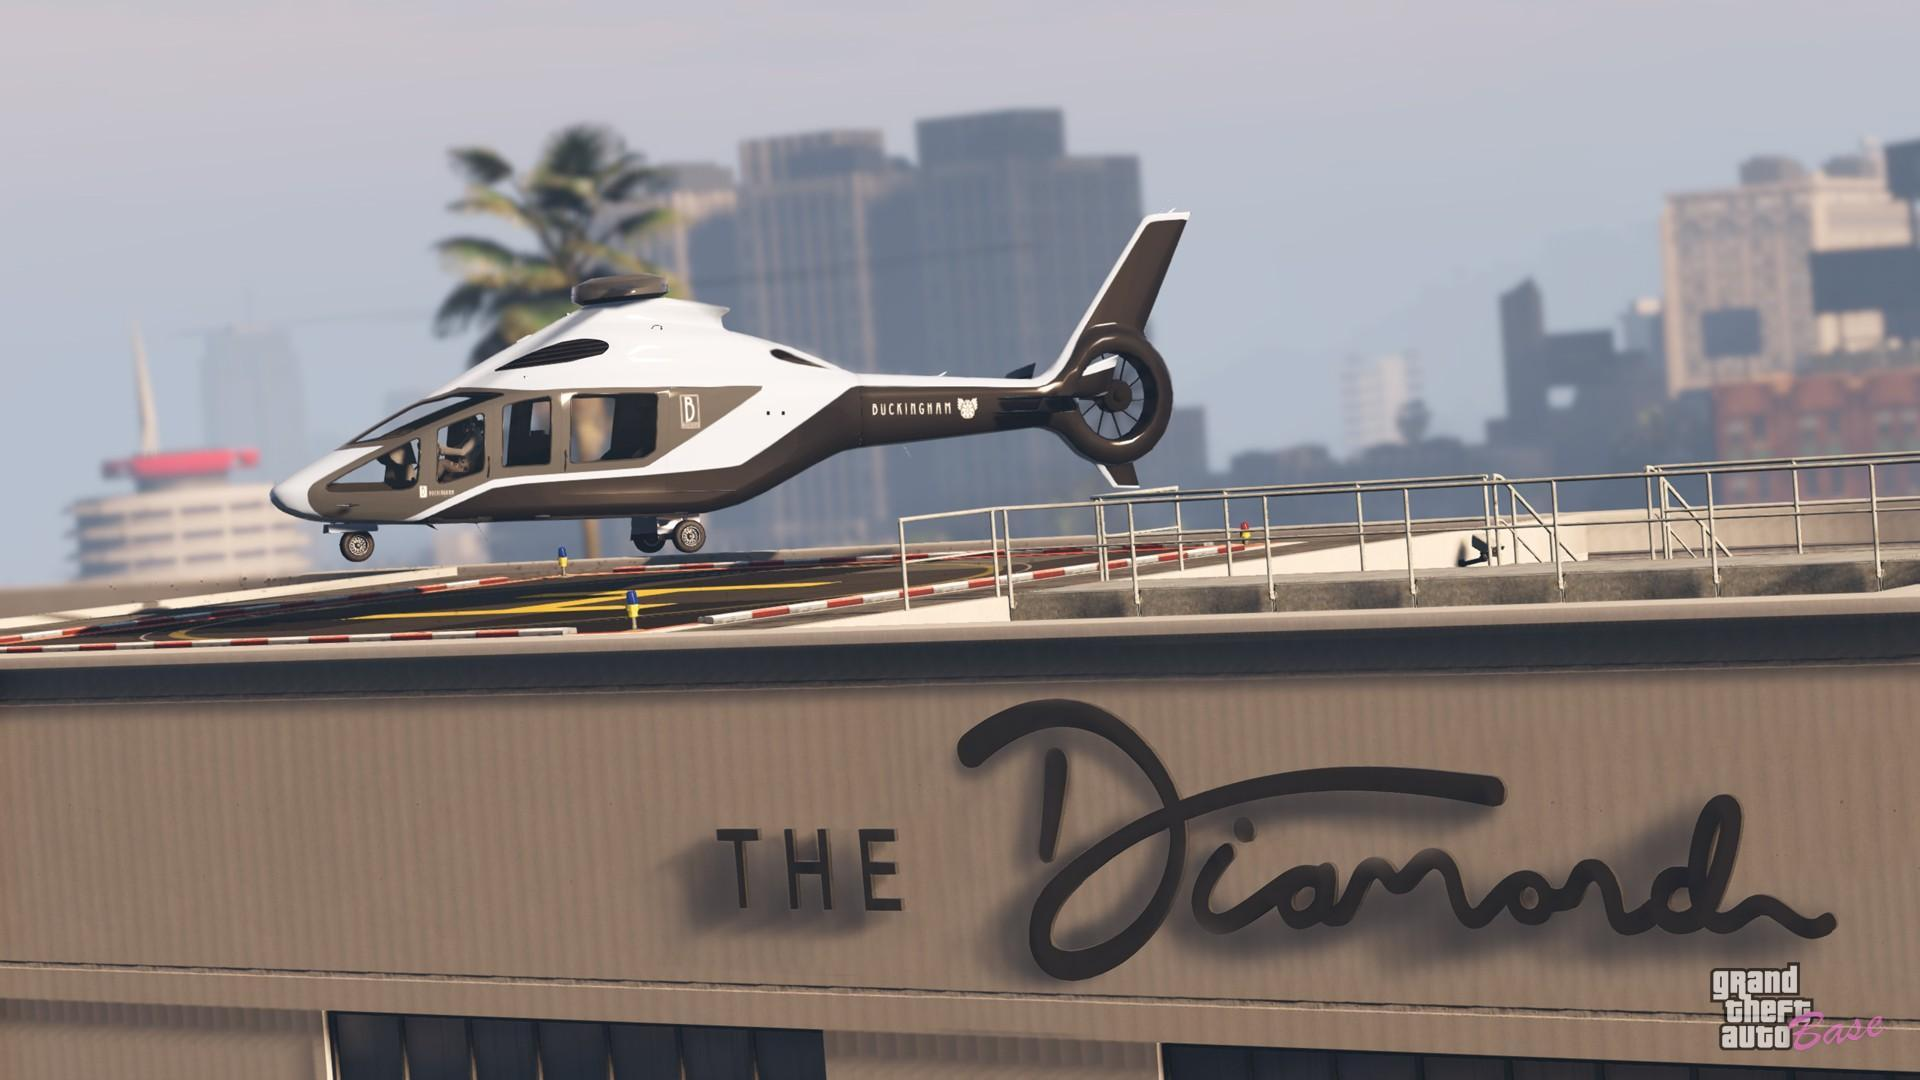 The Diamond Casino Resort In Gta Online All Games Activities Store Membership Gta V Guides Faqs Grand Theft Auto V